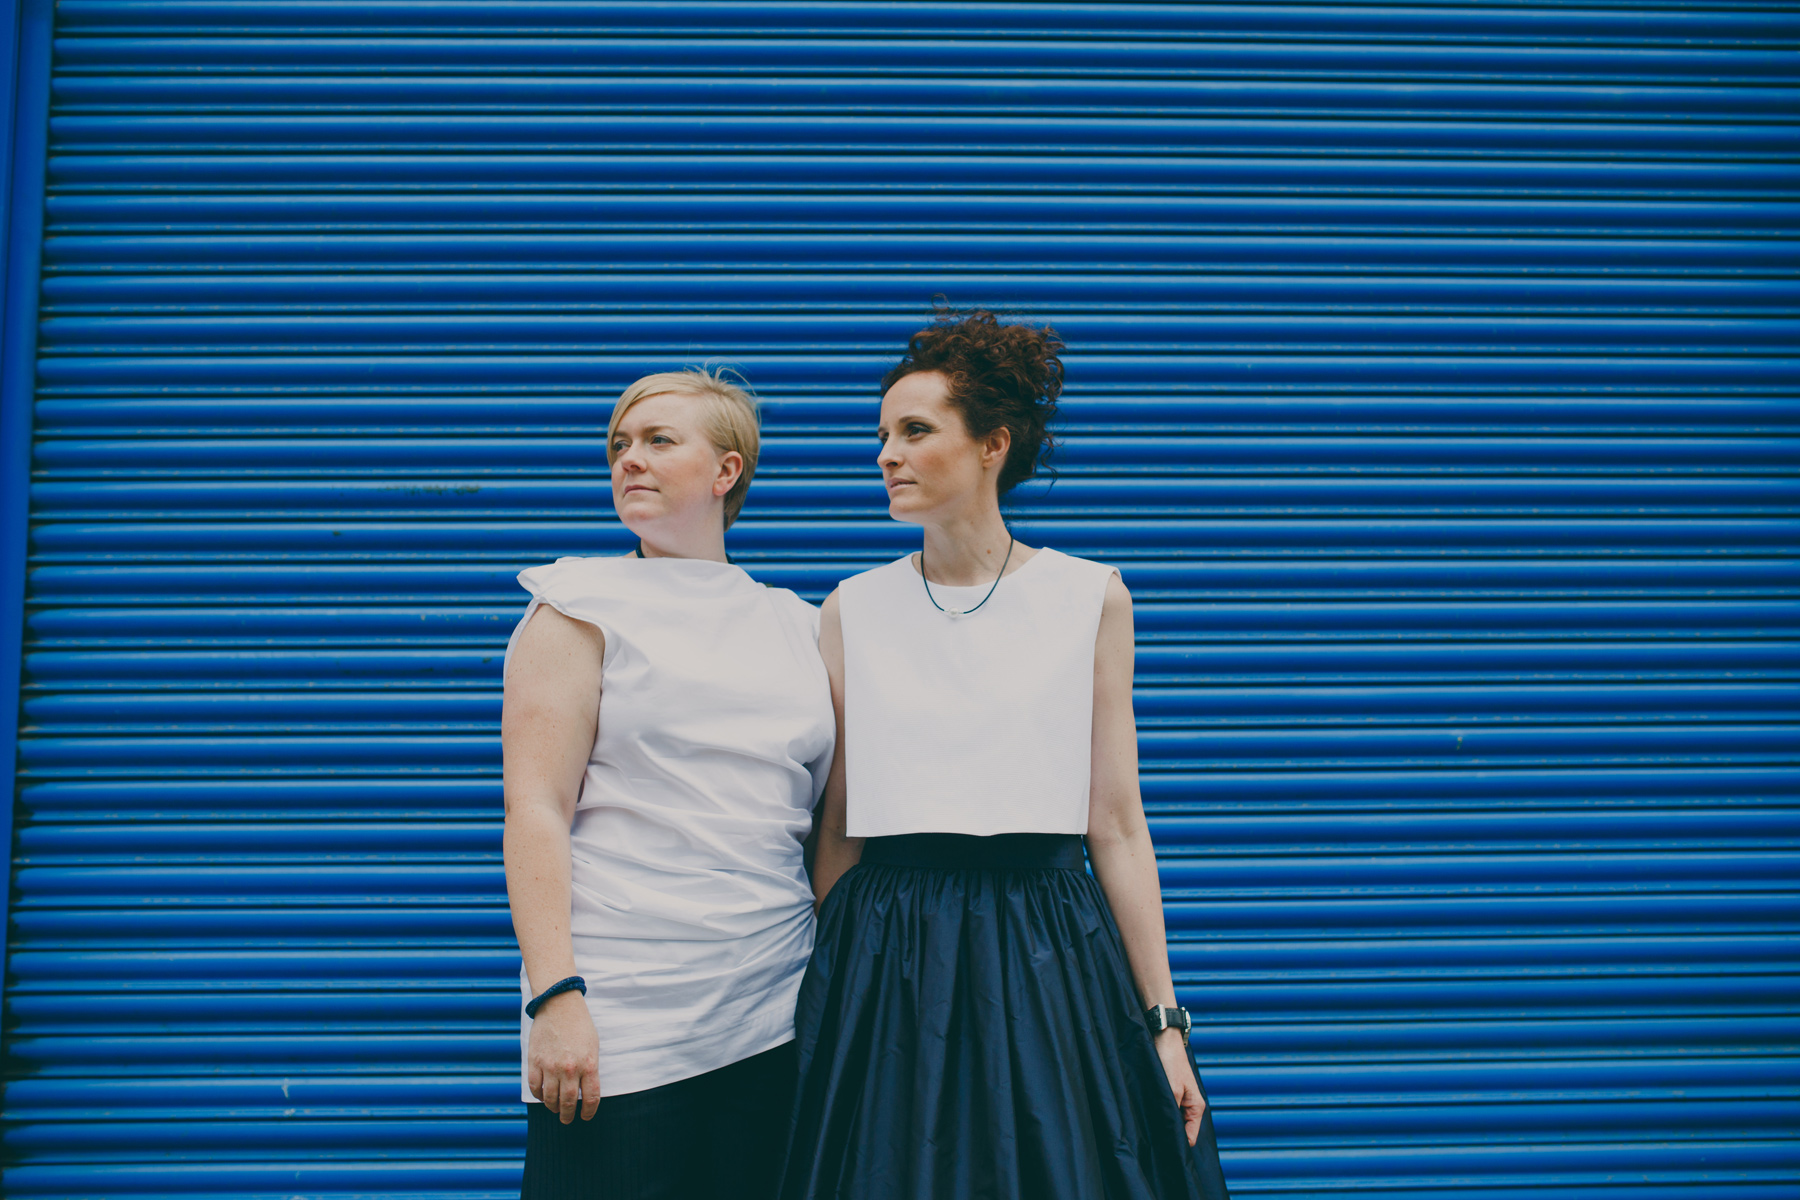 Two brides blue metal gay friendly photographer London.jpg